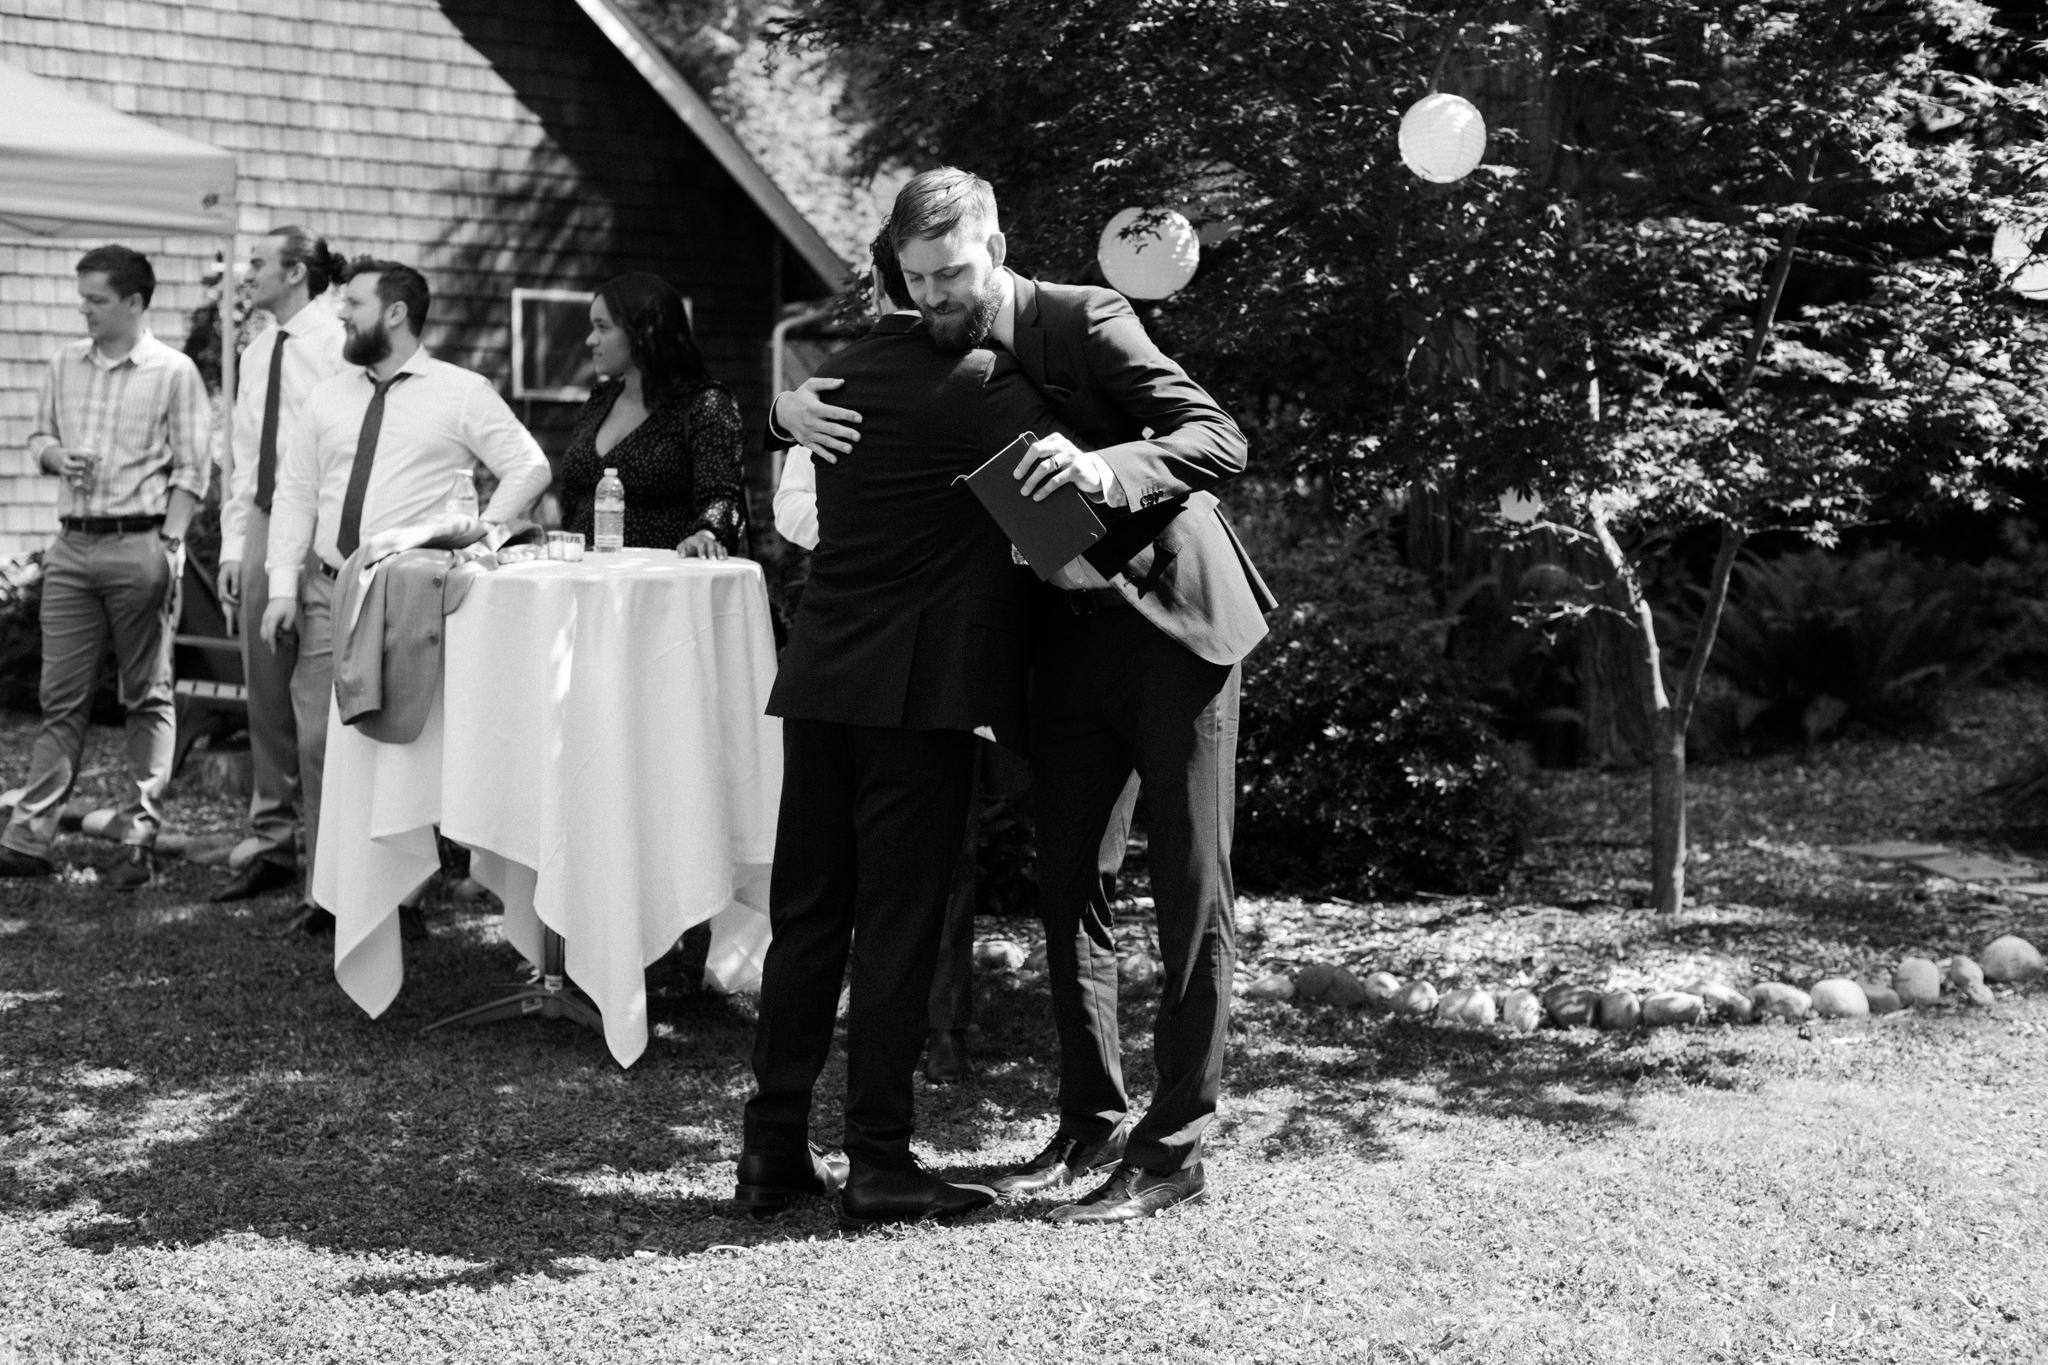 Backyard-Bainbridge-Island-Wedding-Alycia-Lovell-Photography-38.JPG